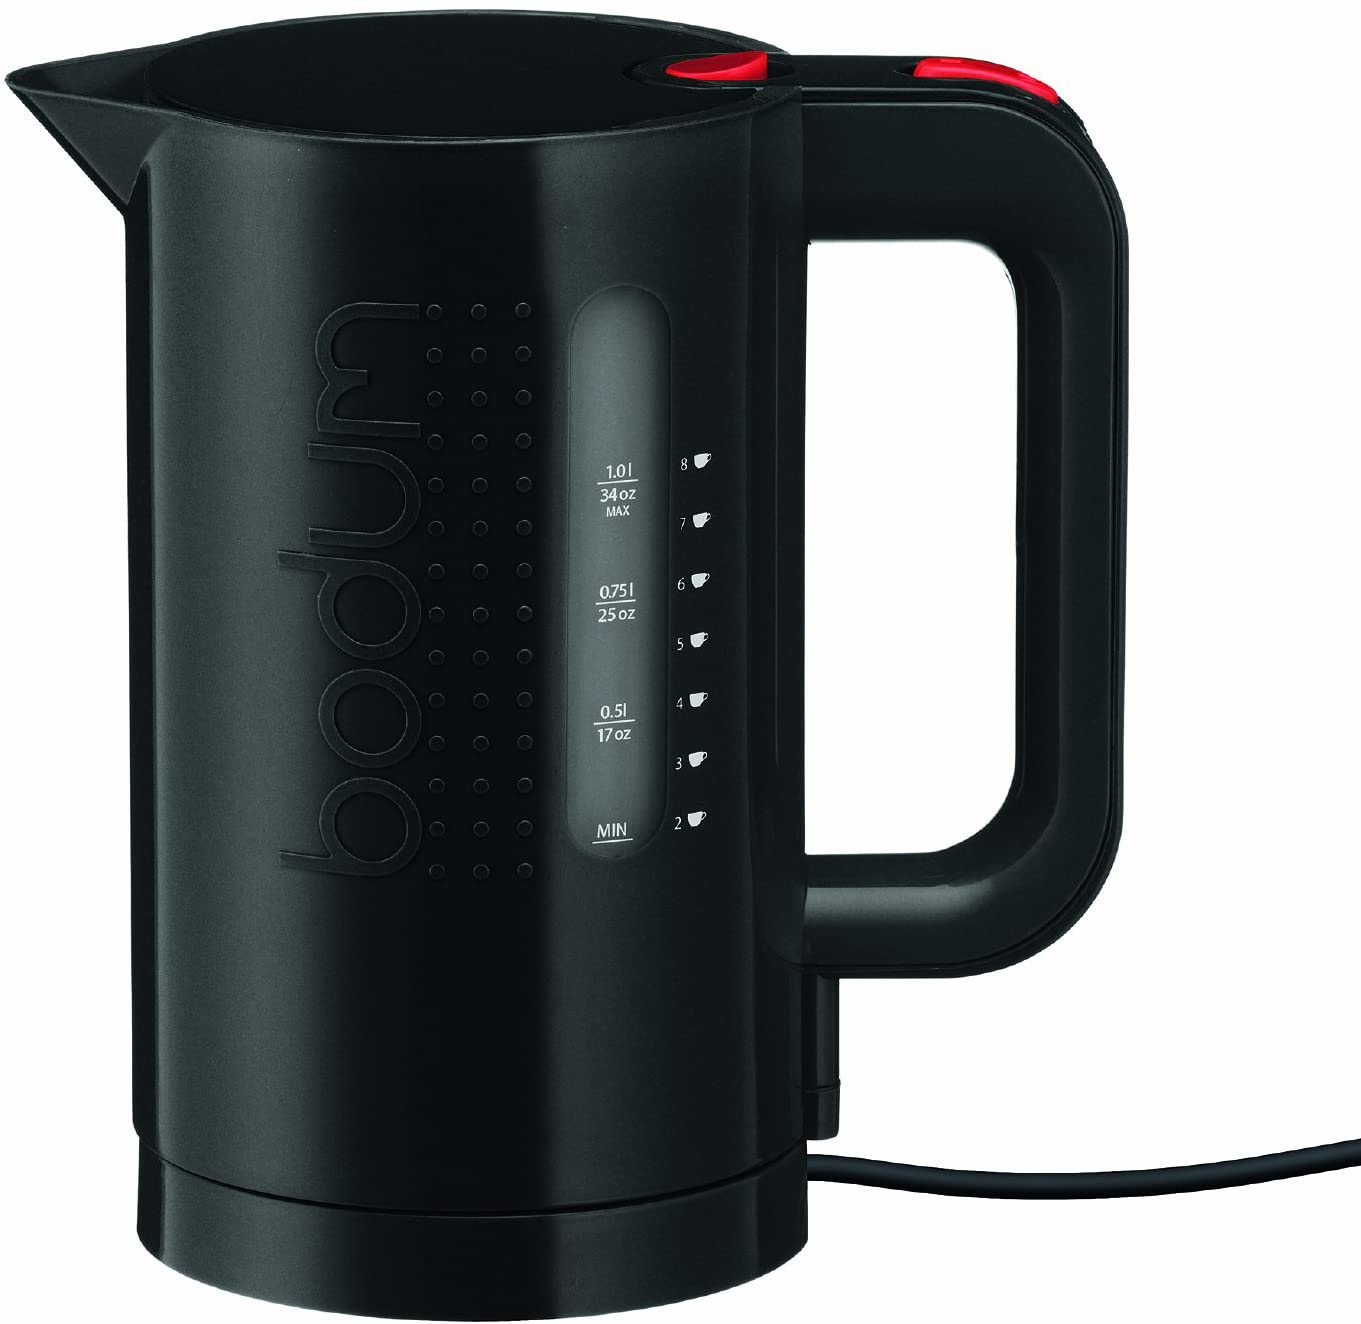 Bodum Bistro Electric Water Kettle, 34 Ounce, 1 Liter, Black